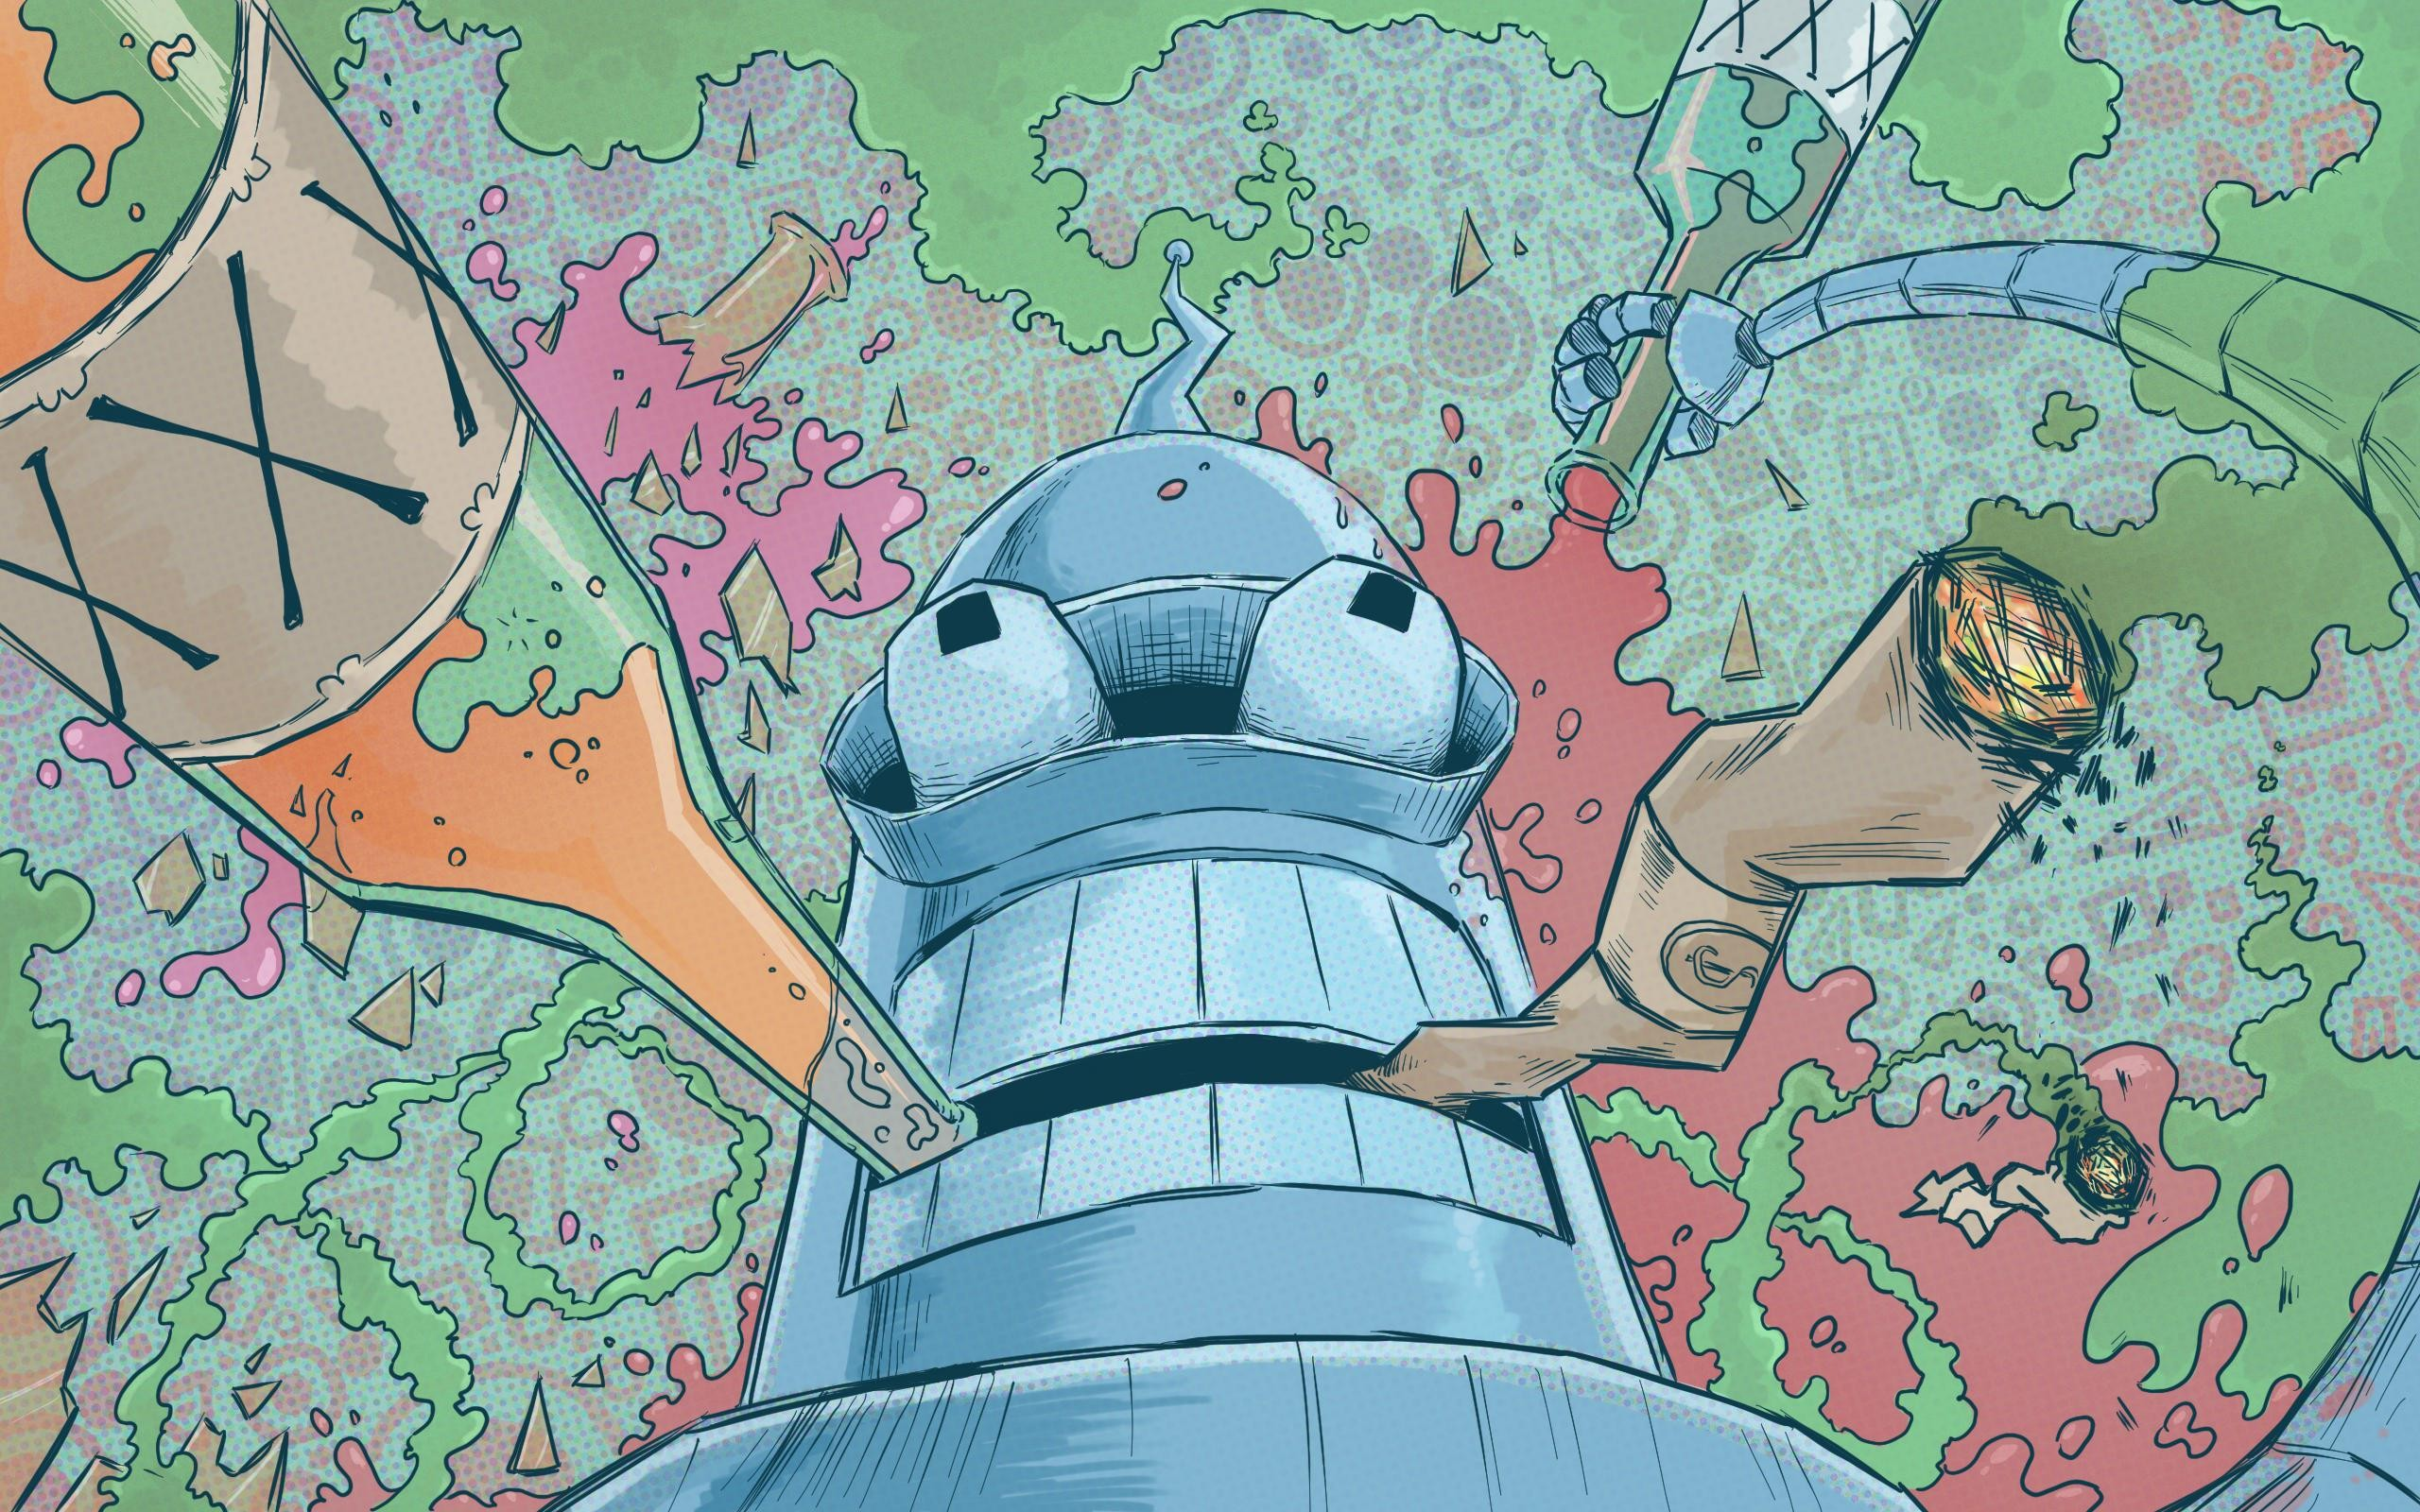 General 2560x1600 Bender Futurama fan art artwork colorful humor alcohol joints